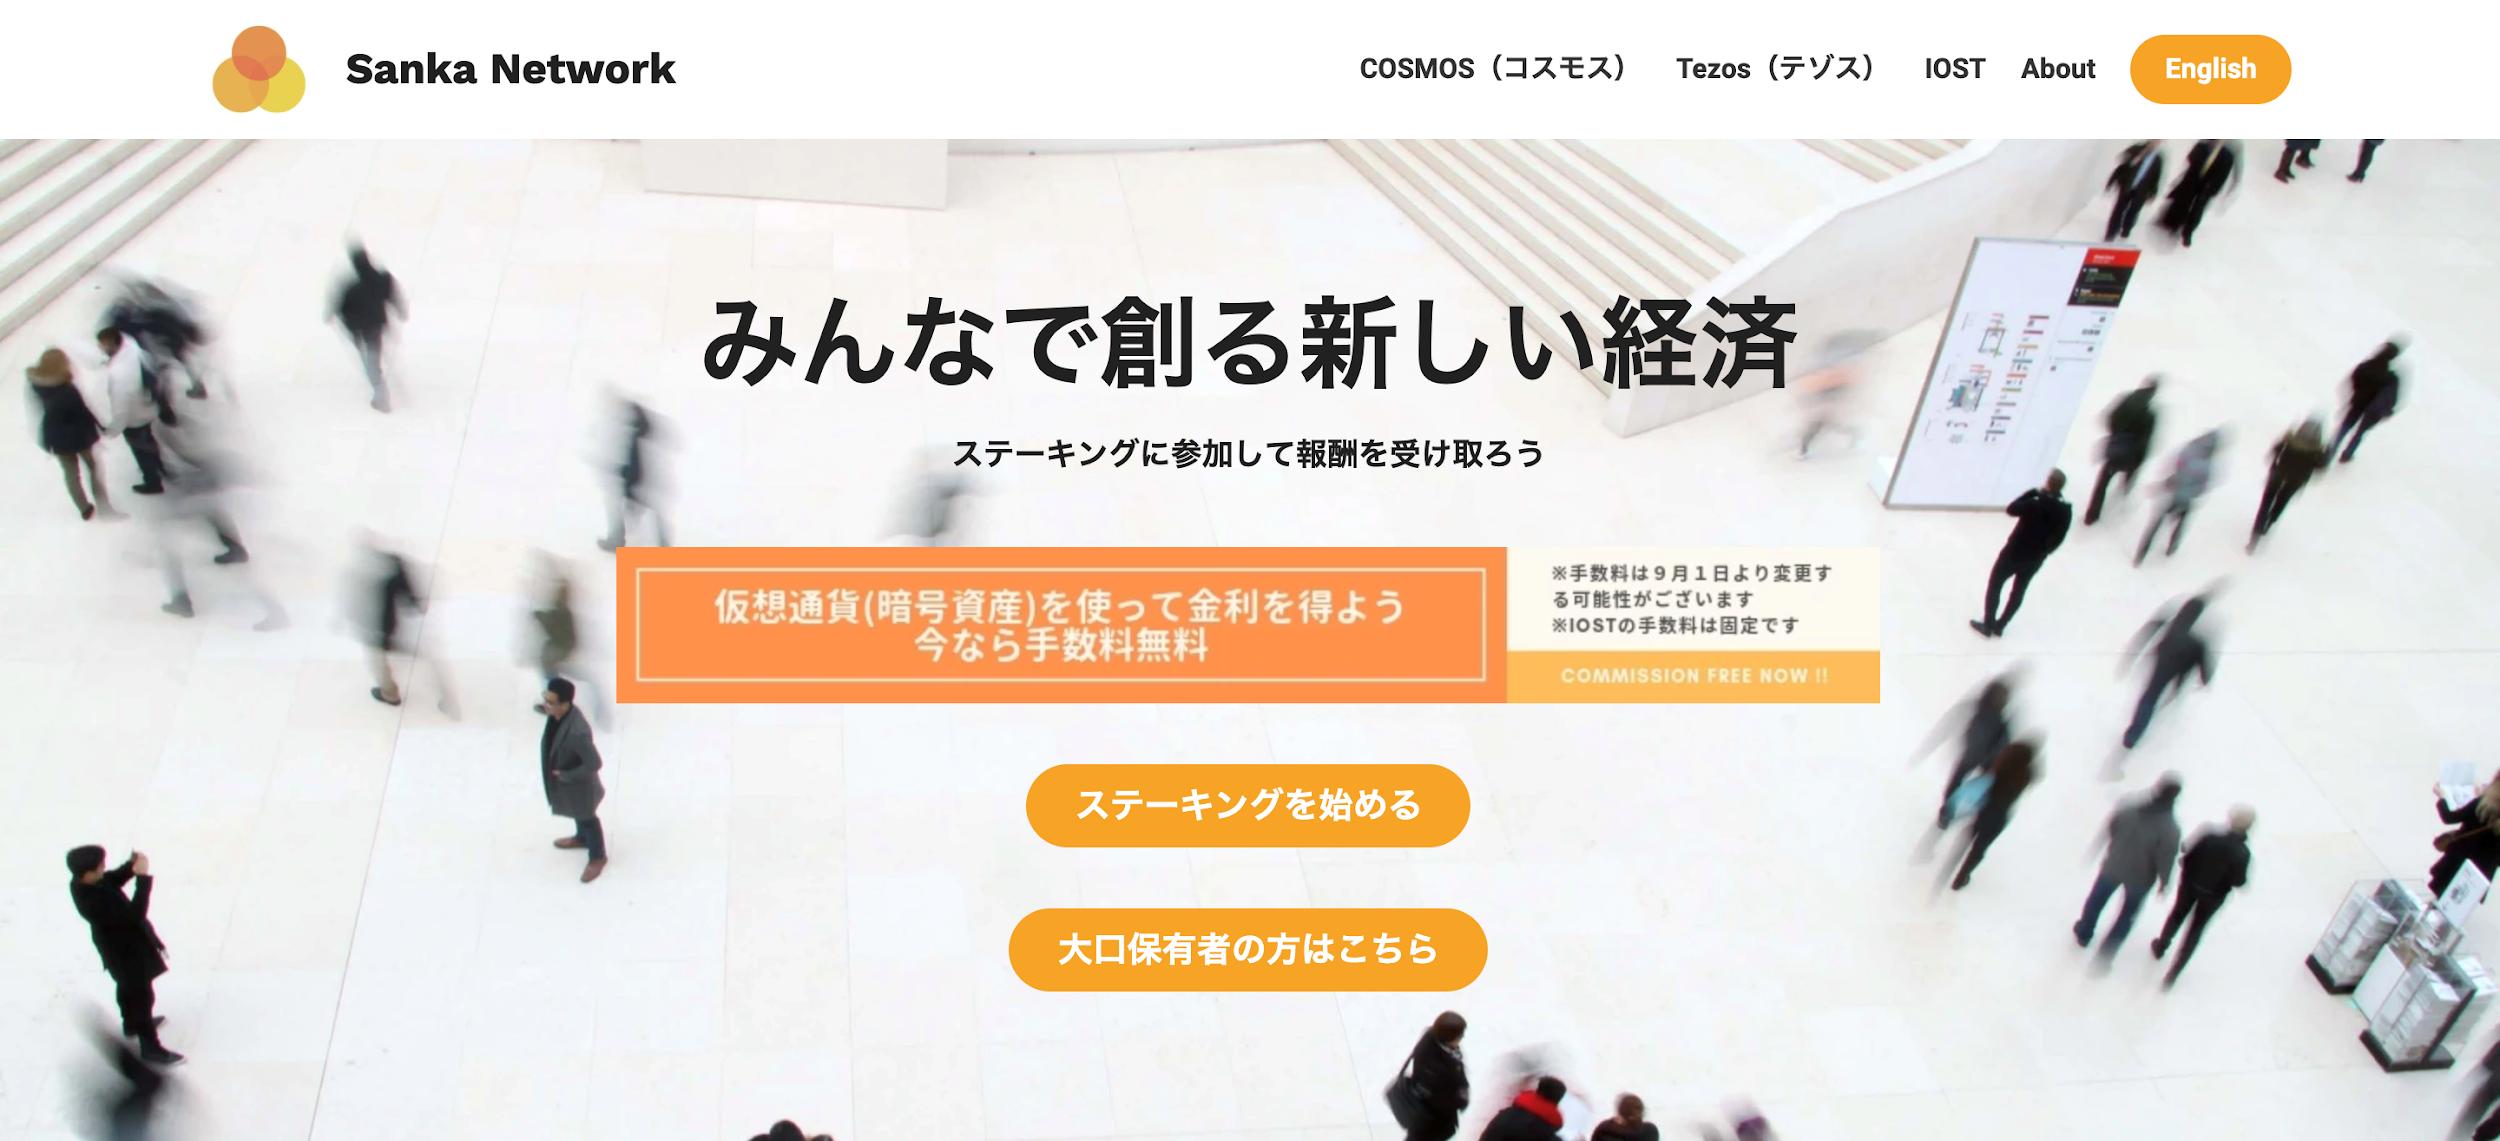 Sanka NetworkのTop画像